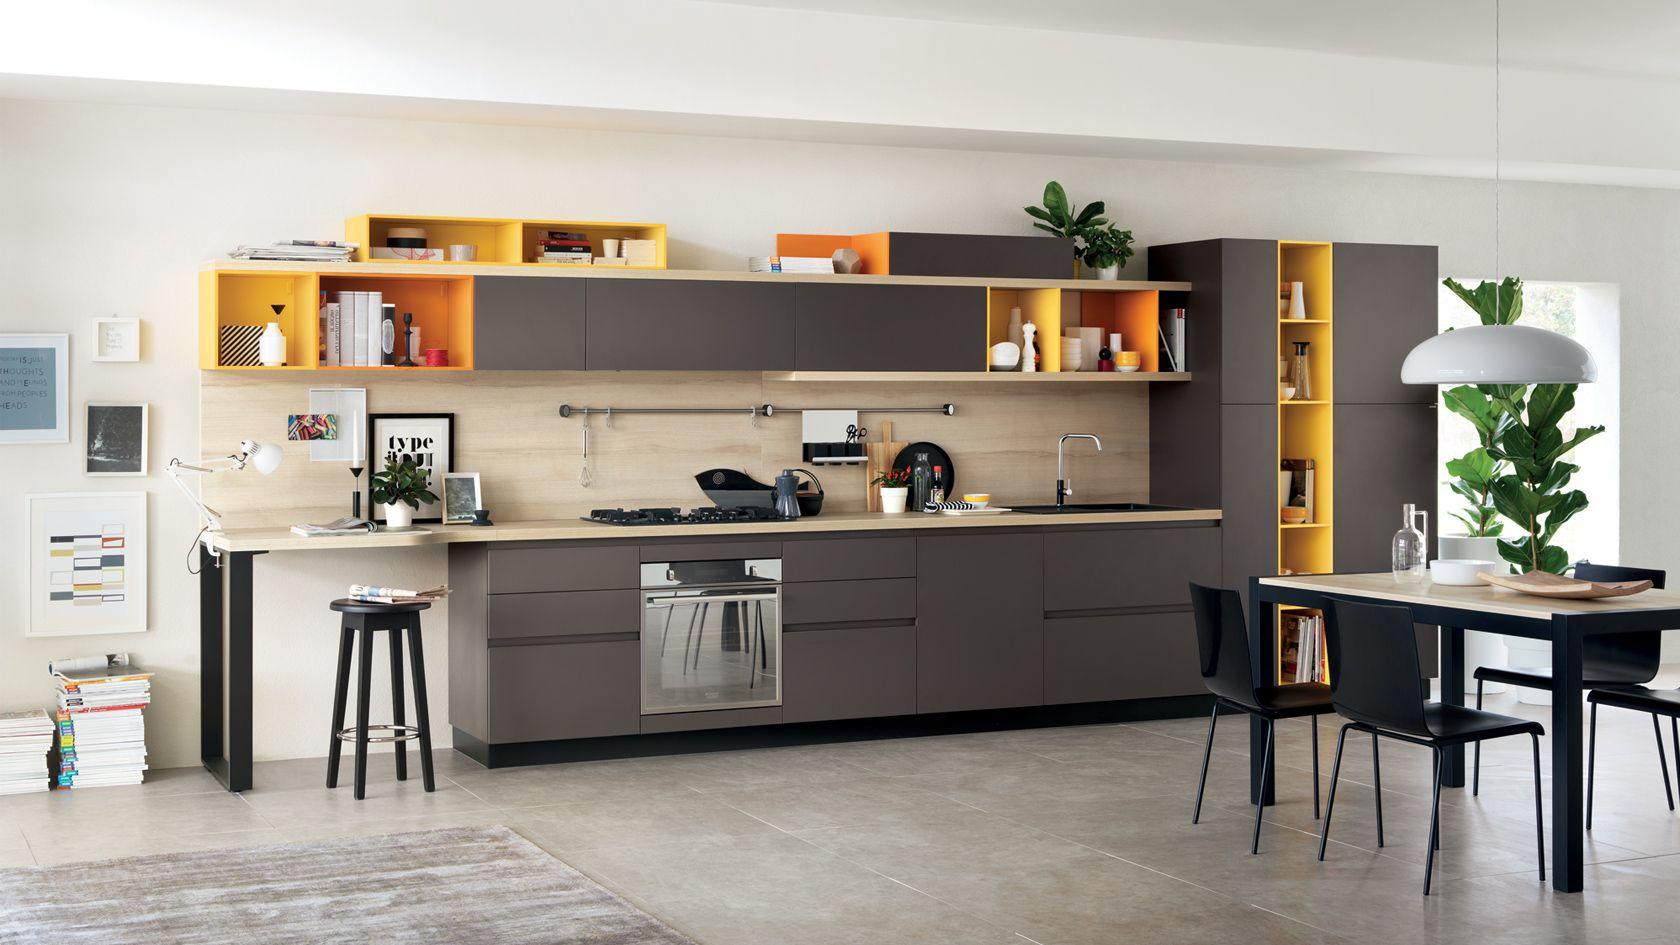 Foodshelf | Kitchen | Pinterest | Cocinas, Lechuga y Cocina lineal